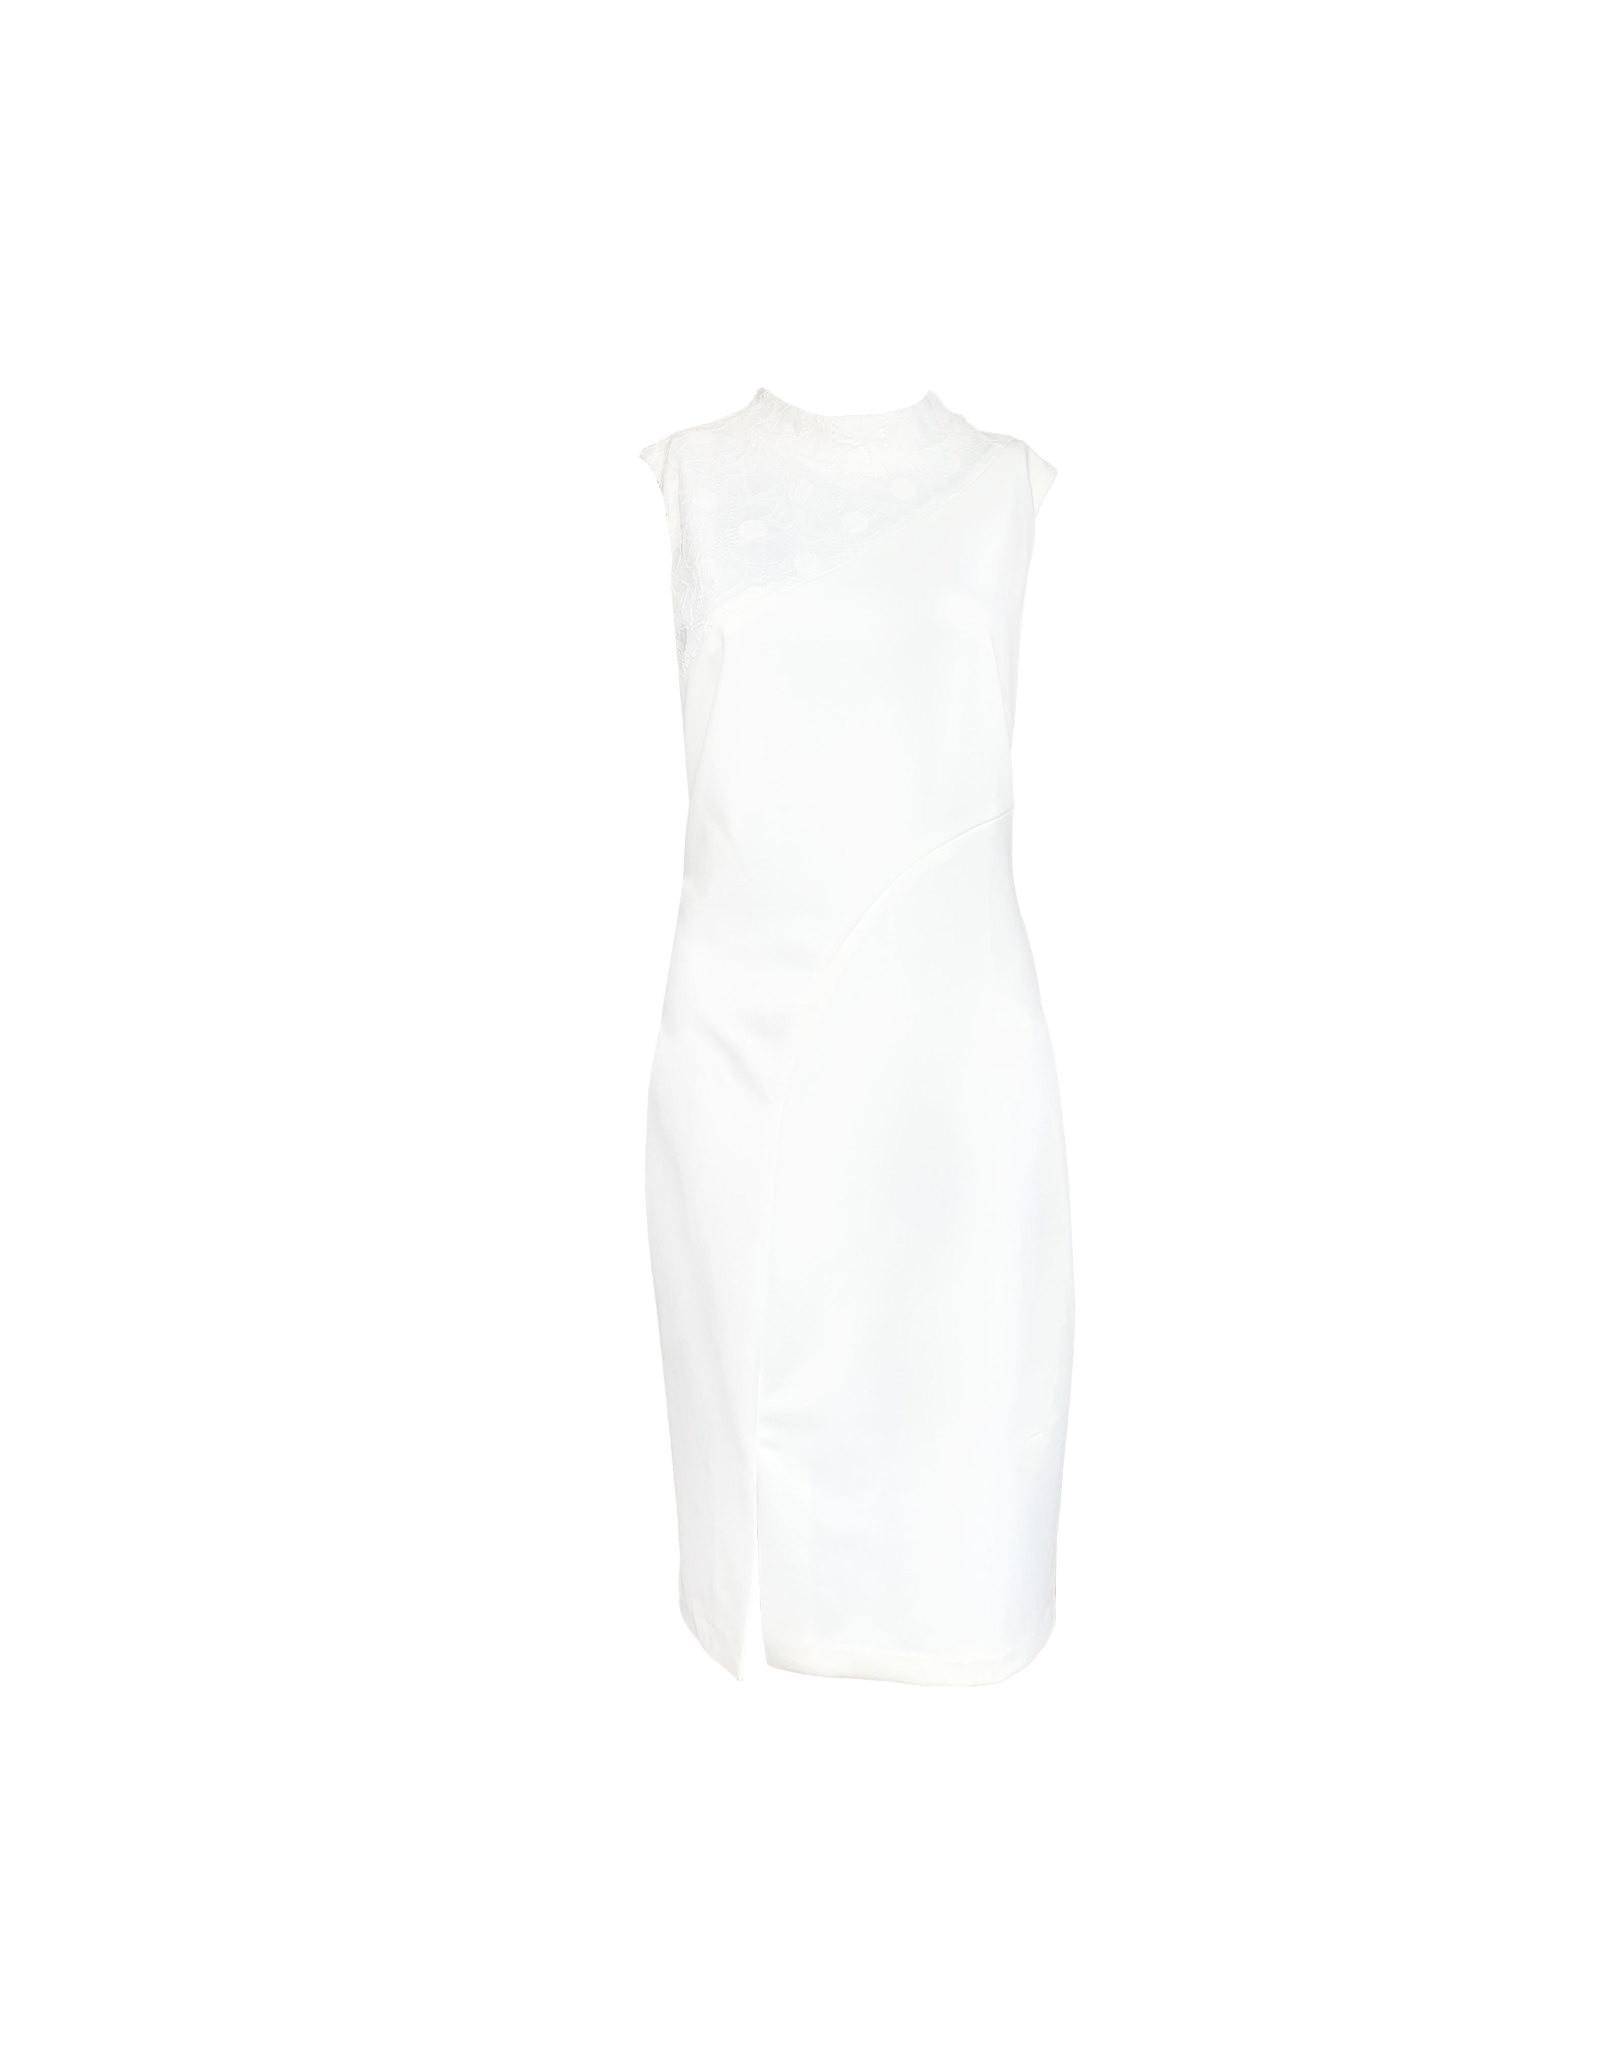 DKNY white sleeveless above the knee size 12